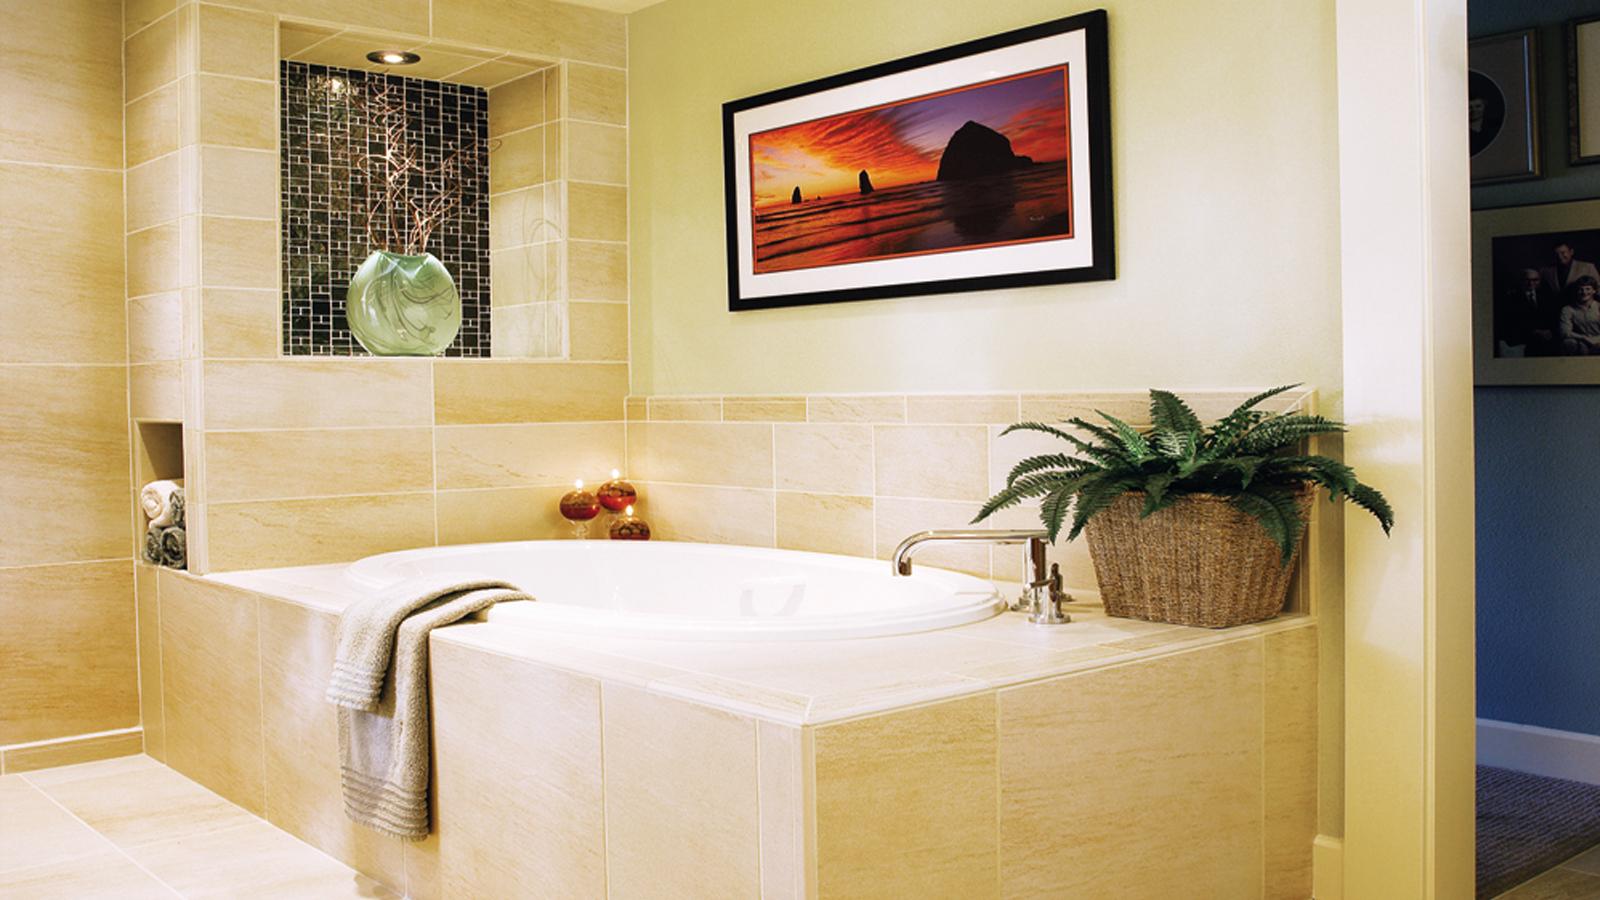 Cream bathroom with large white tub